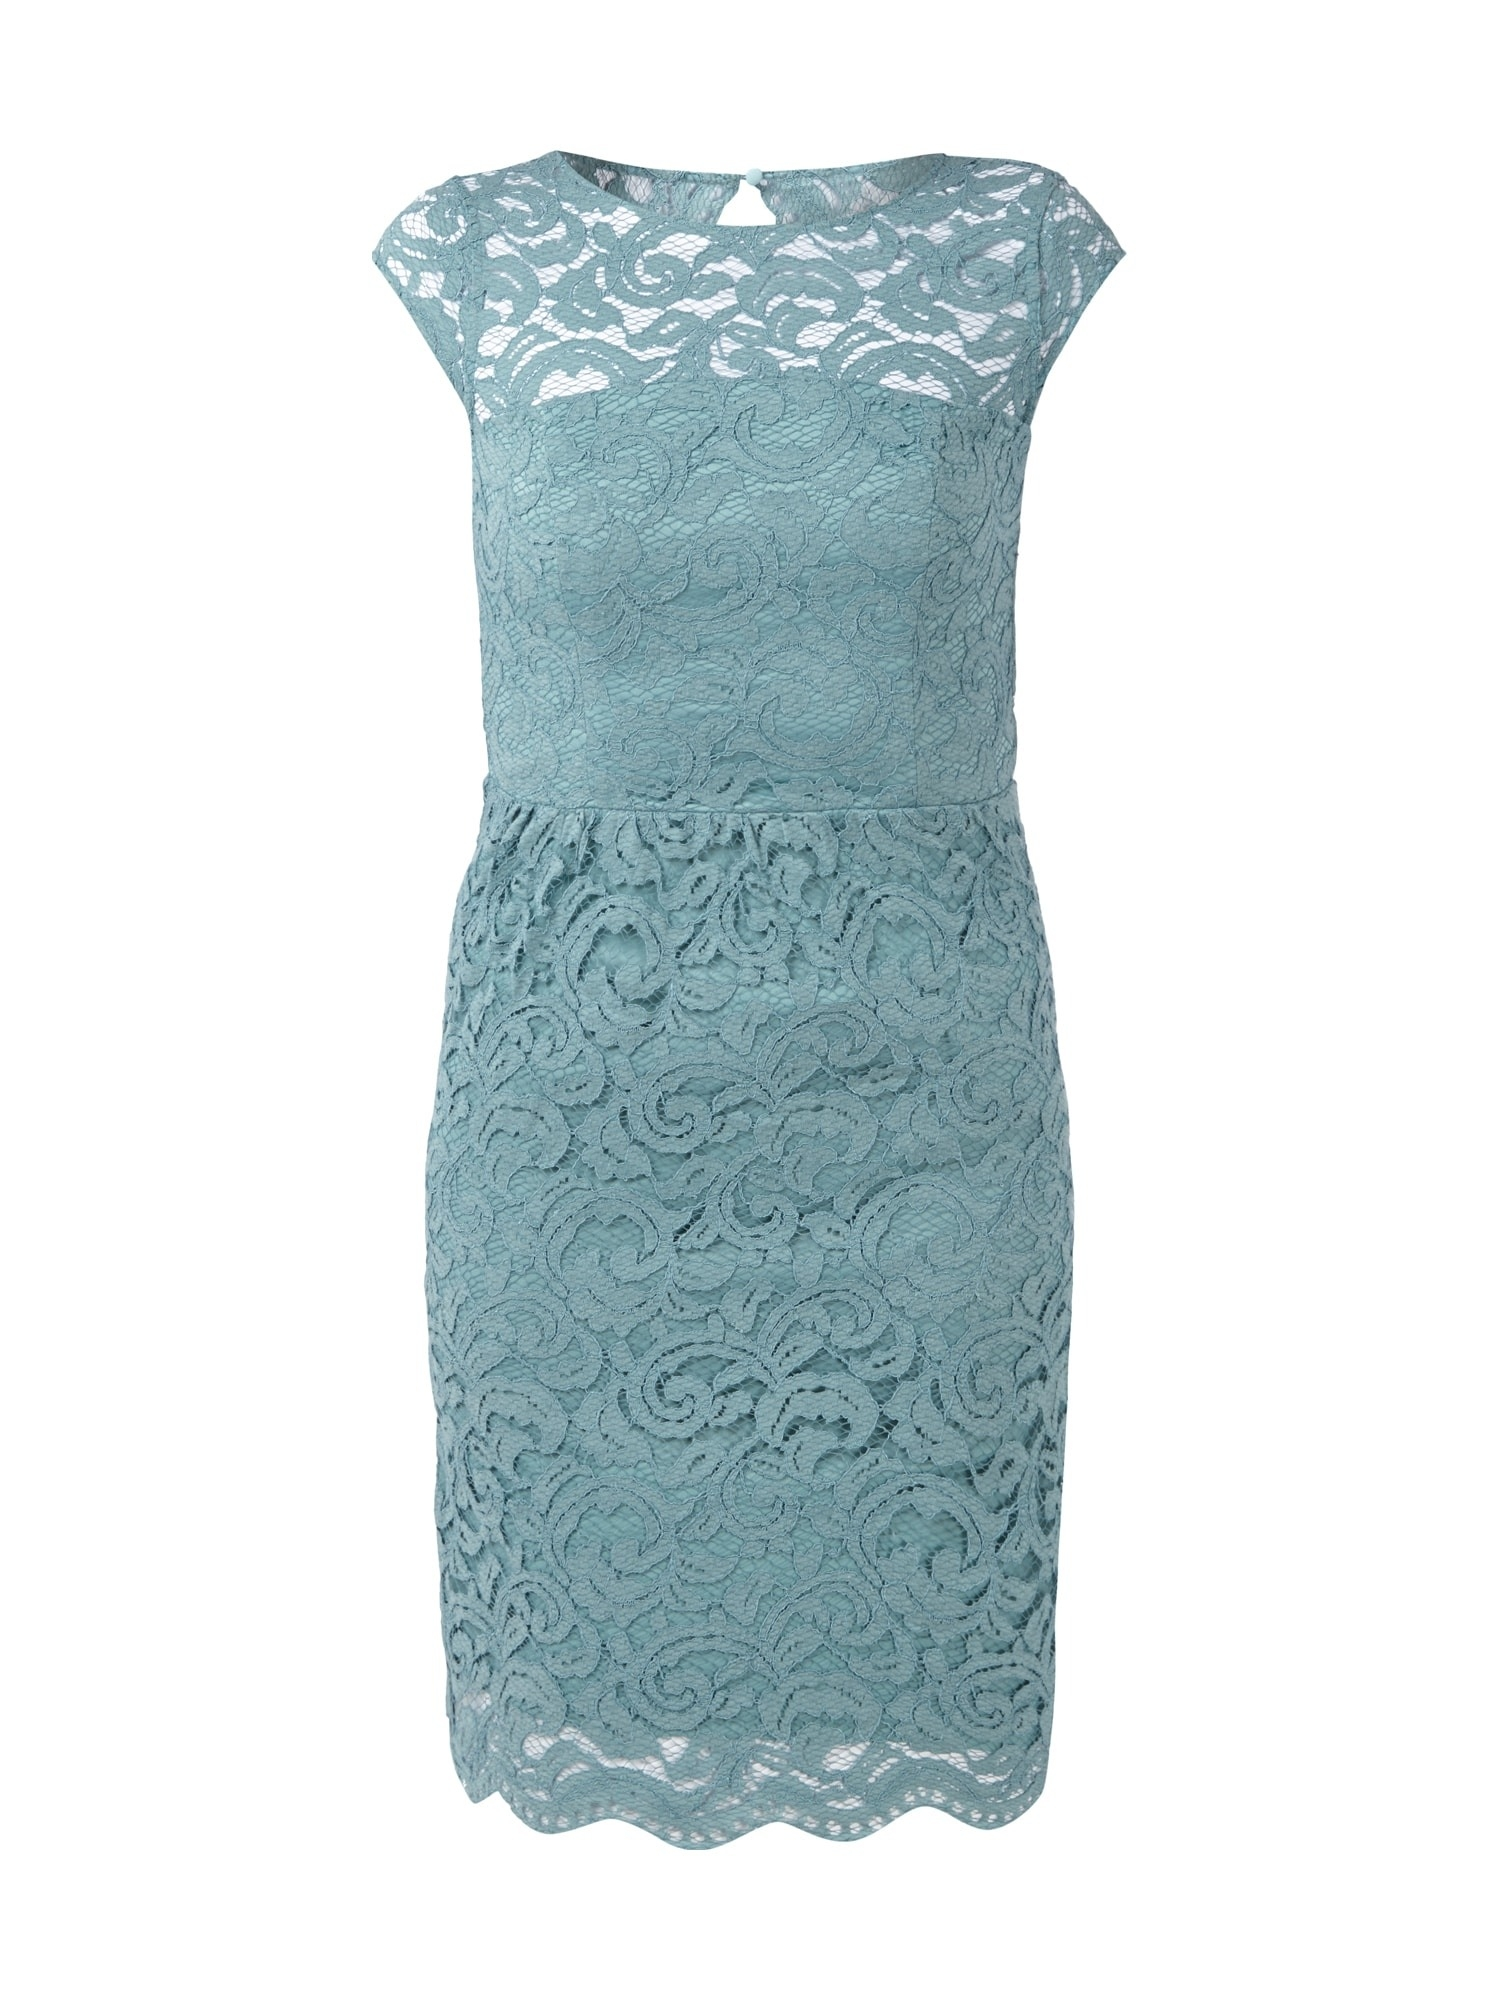 Formal Genial Kleid Mintgrün Spitze Bester Preis Genial Kleid Mintgrün Spitze Vertrieb